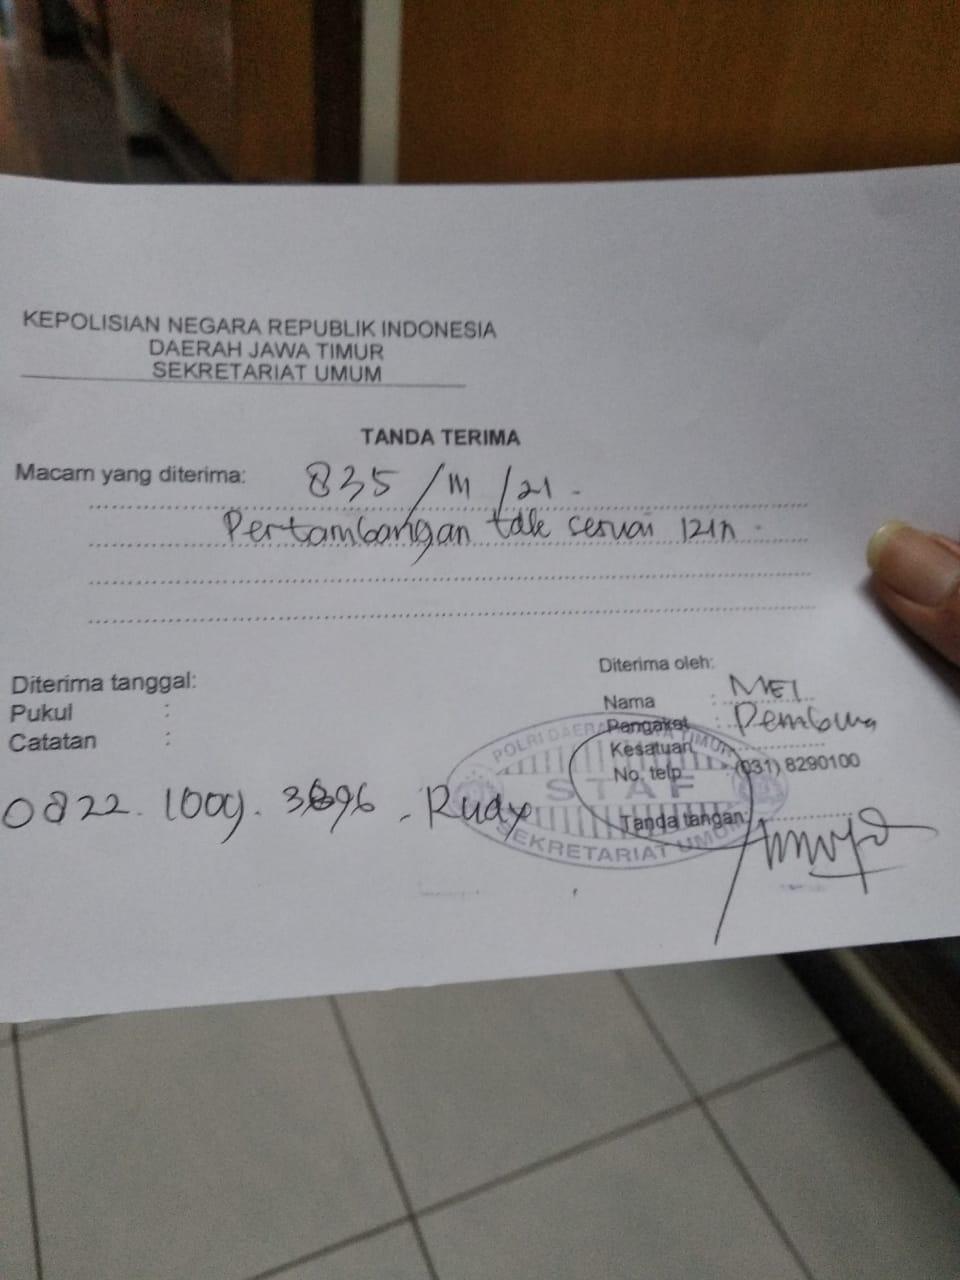 Surat keterangan PSPLM Laporan Galian C